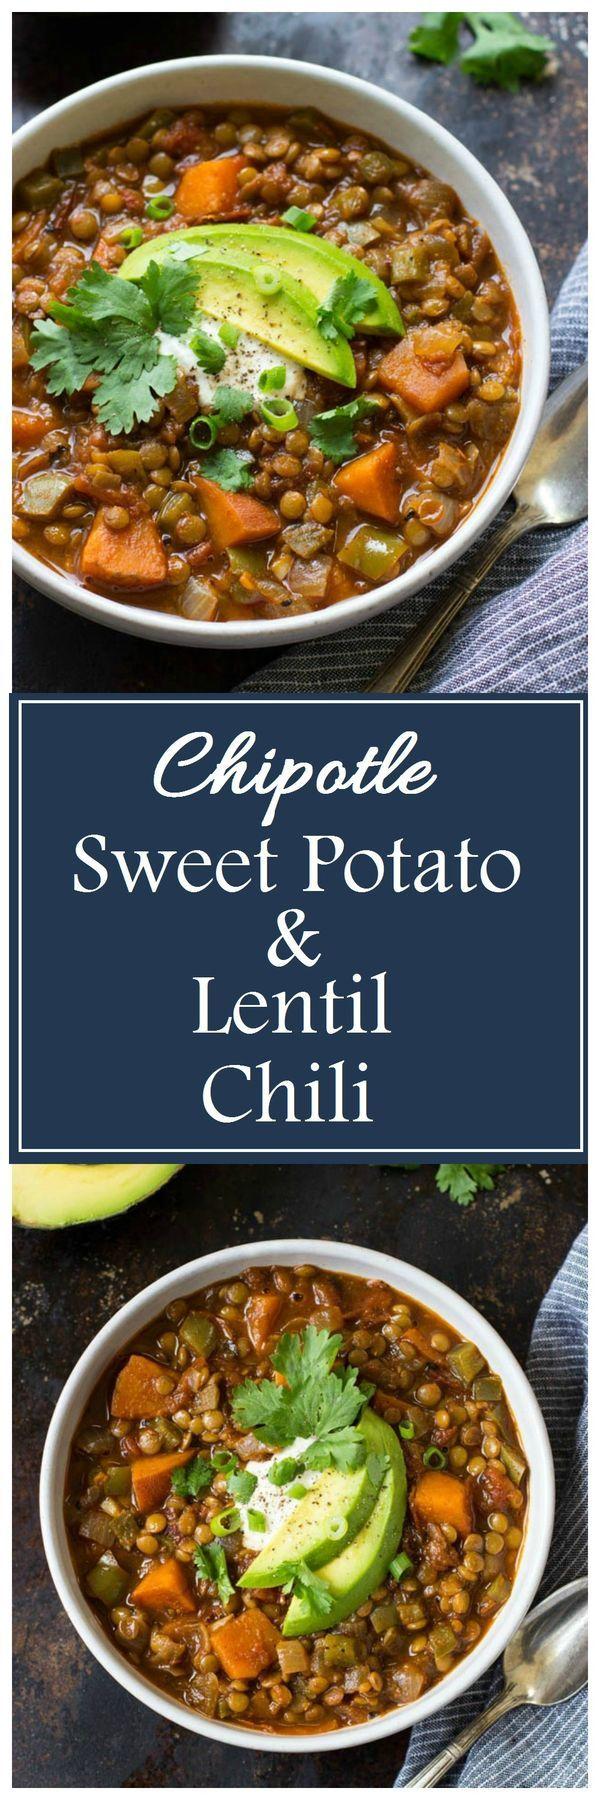 Best 25+ Best chili recipe ideas on Pinterest | Beef chili ...